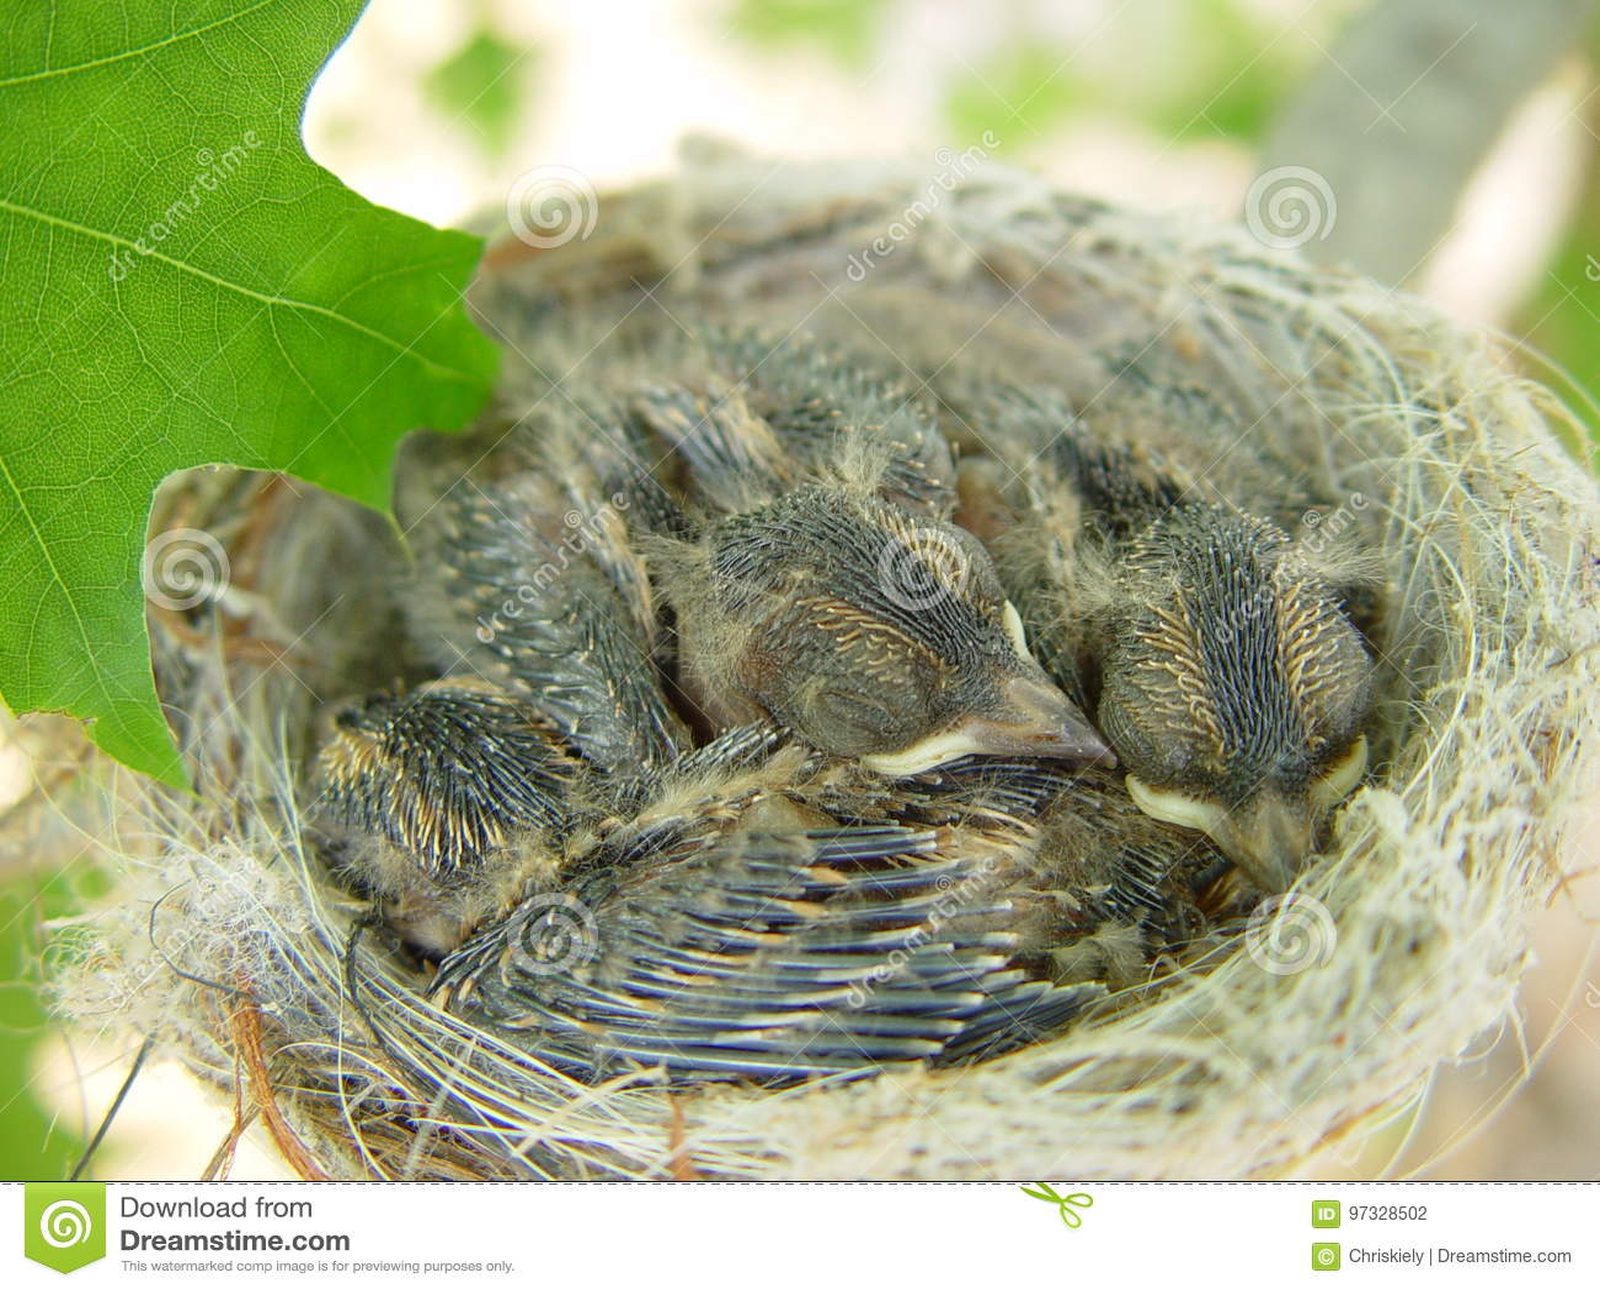 Baby Grossartige Feenhafte Zaunkonige Im Nest Stockfoto Bild Von